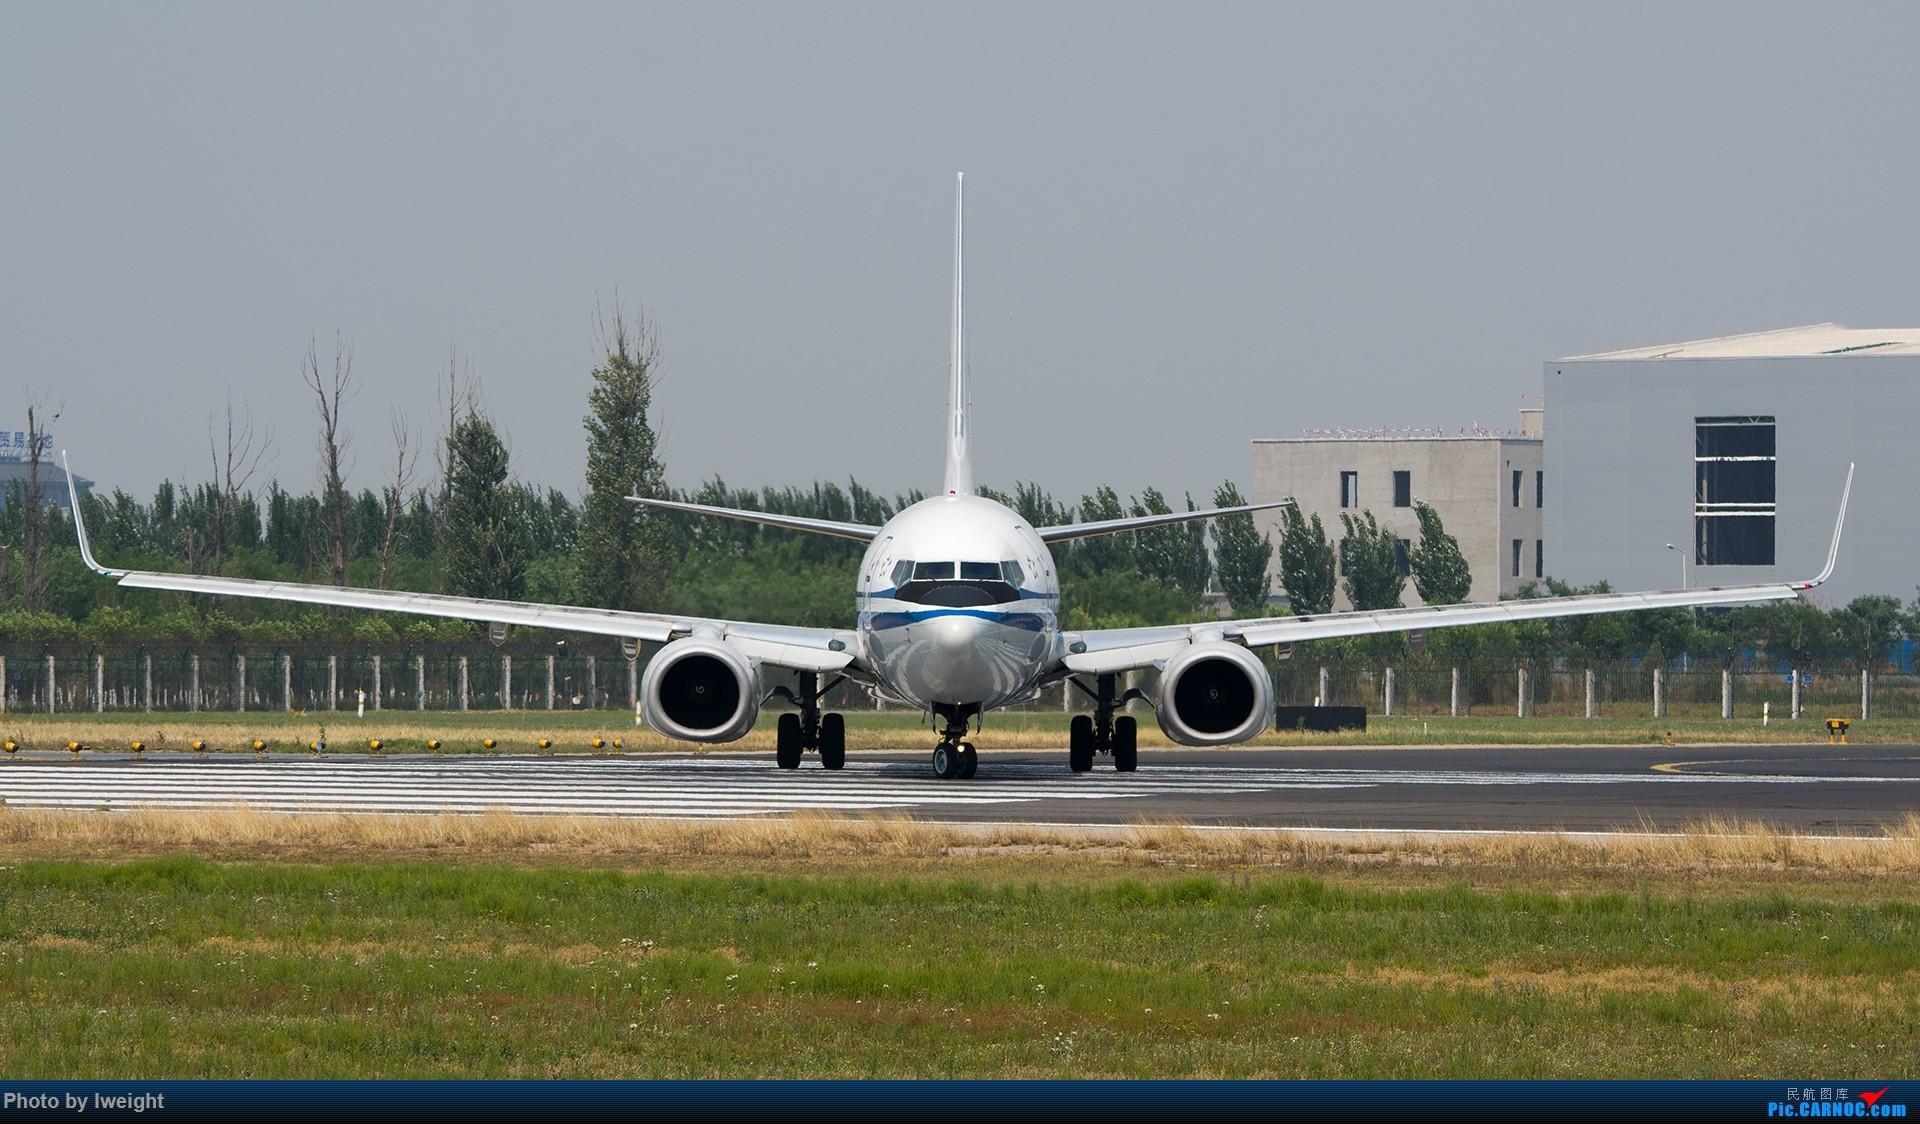 Re:[原创]周末帝都霾天拍机,凑合看看吧【2015-5-23】 BOEING 737-800 B-5443 中国北京首都国际机场